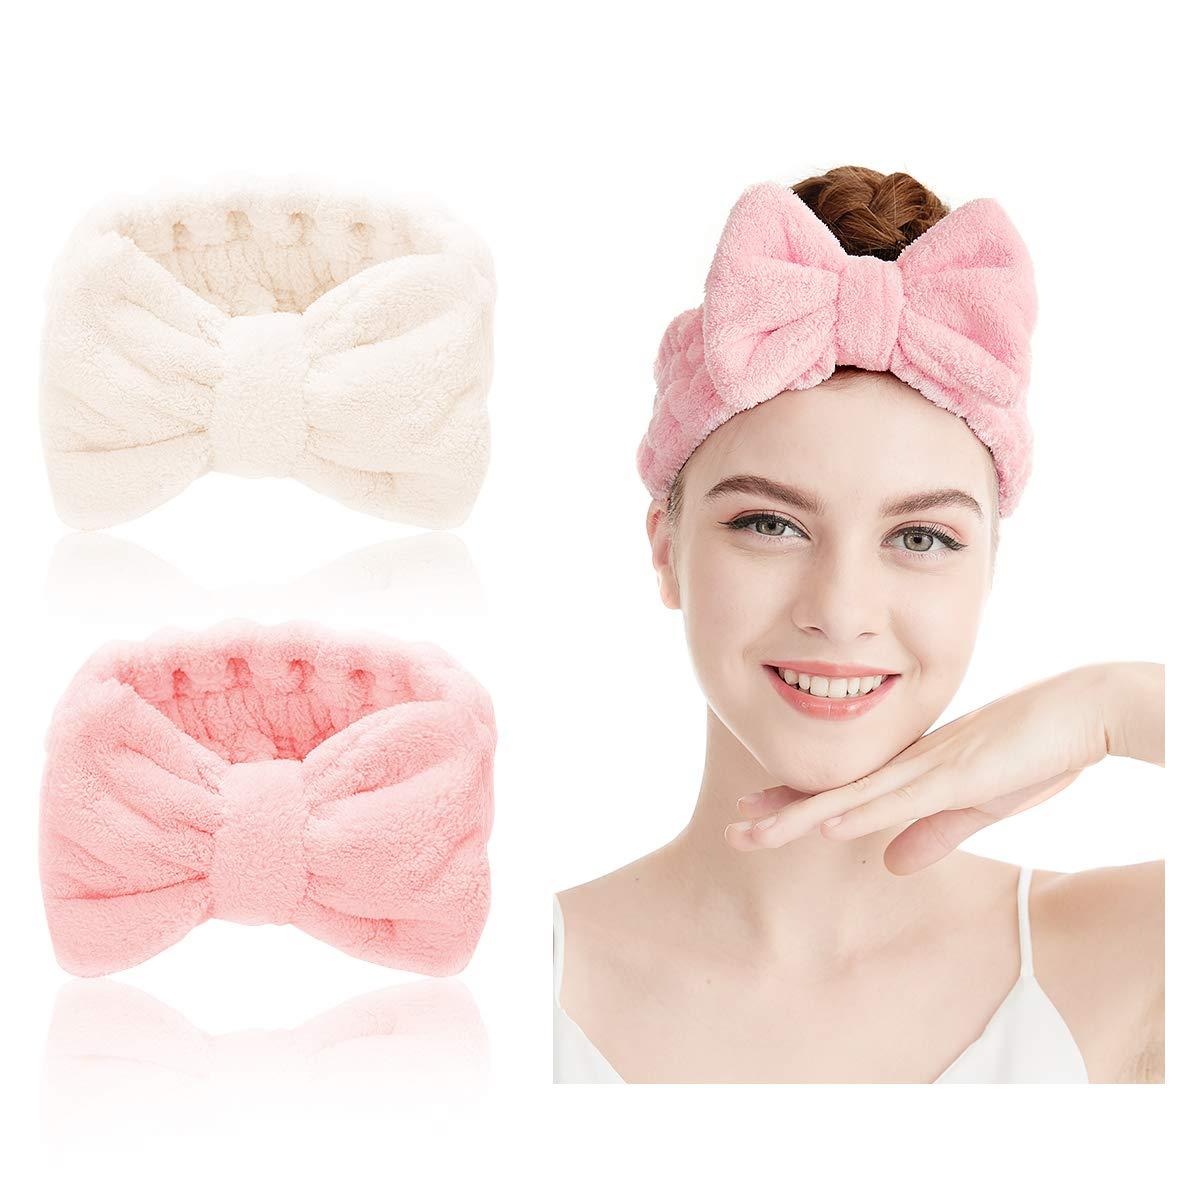 Details about  /Elastic Adjustable Towel Wrap Head Band Facial Salon Make Up SPA Beauty CSL2